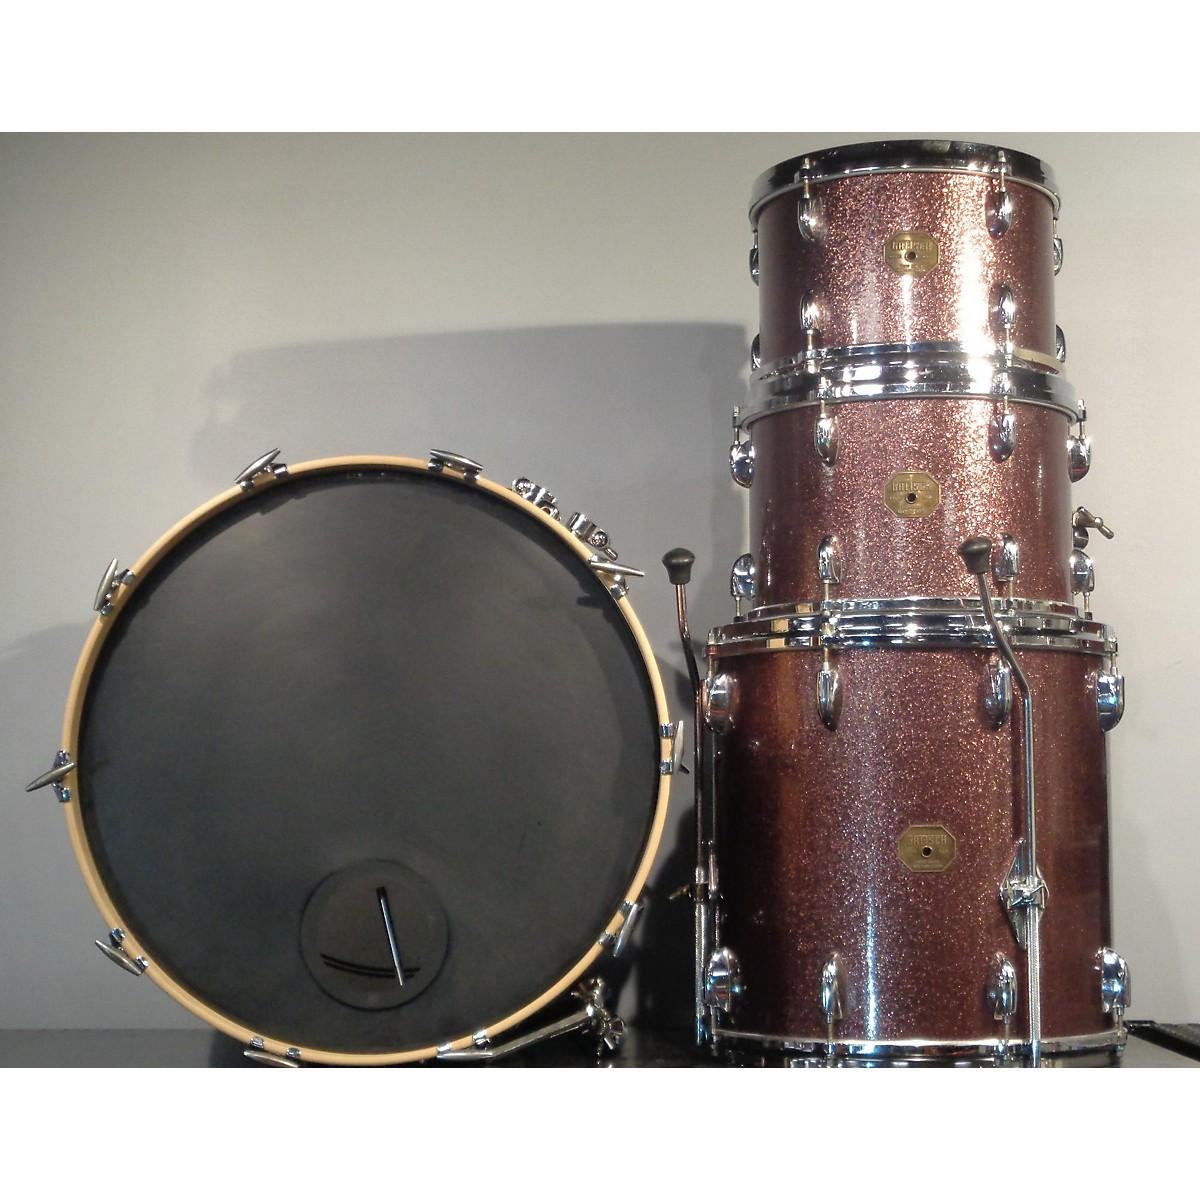 Gretsch Drums 1970s 70's Recording Kit Drum Kit